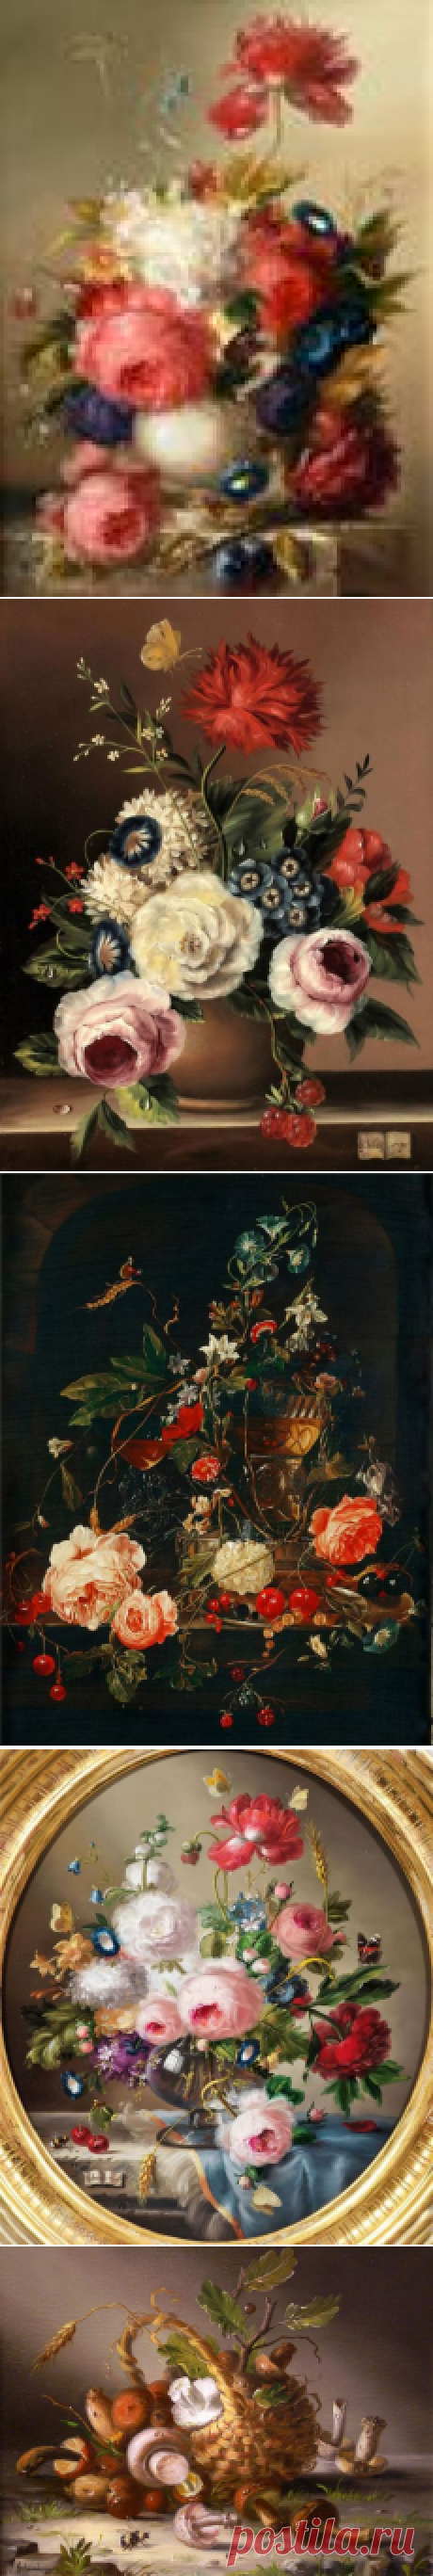 Hildegard Schwammberger - миниатюрная живопись...